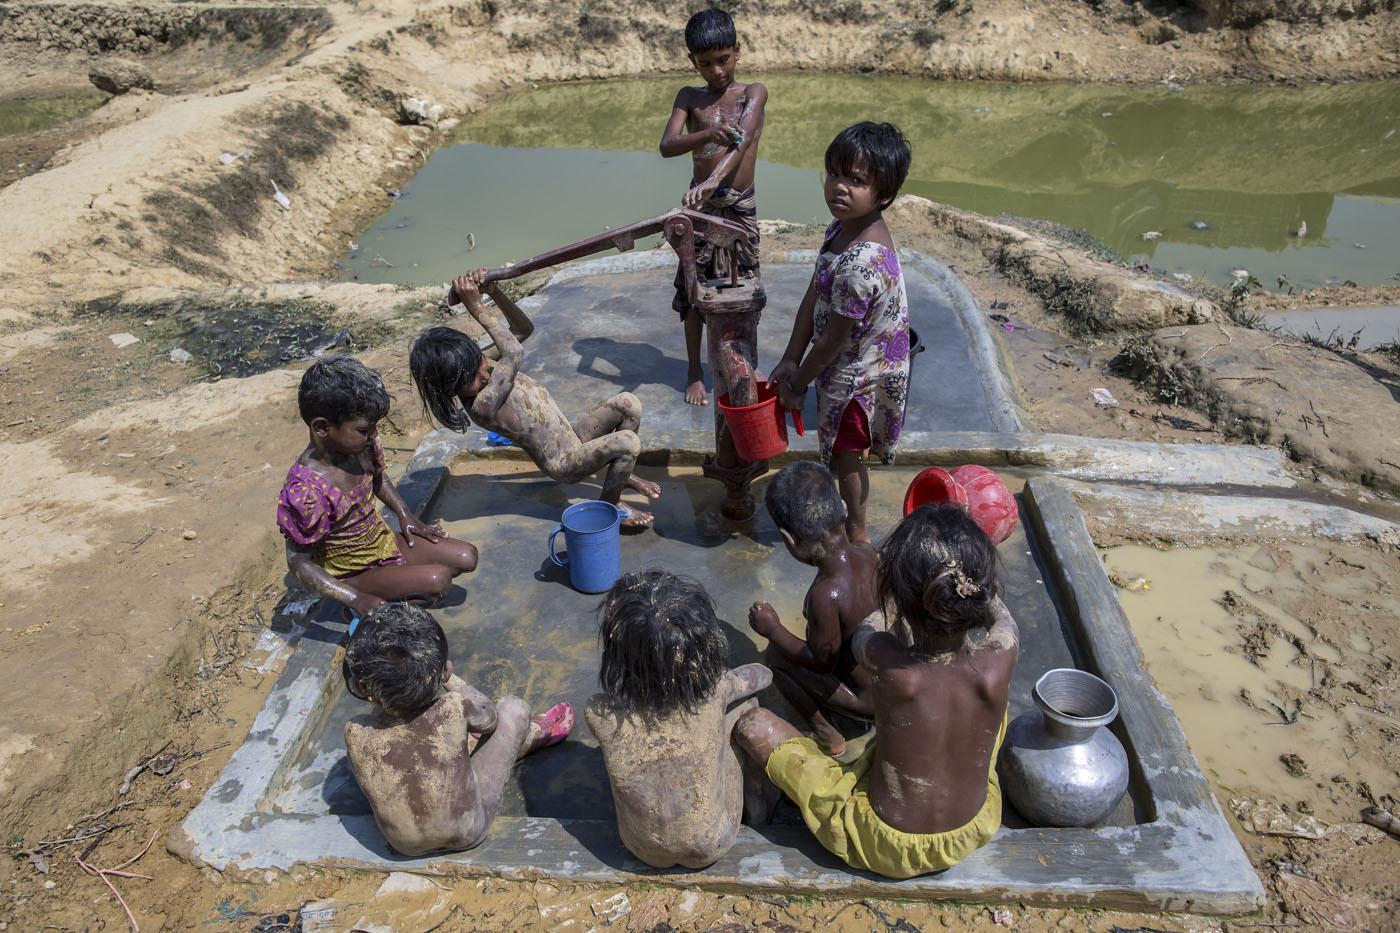 Probal Rashid_Bangladesh_The Rohingyas-A People Without A Home_15.jpg